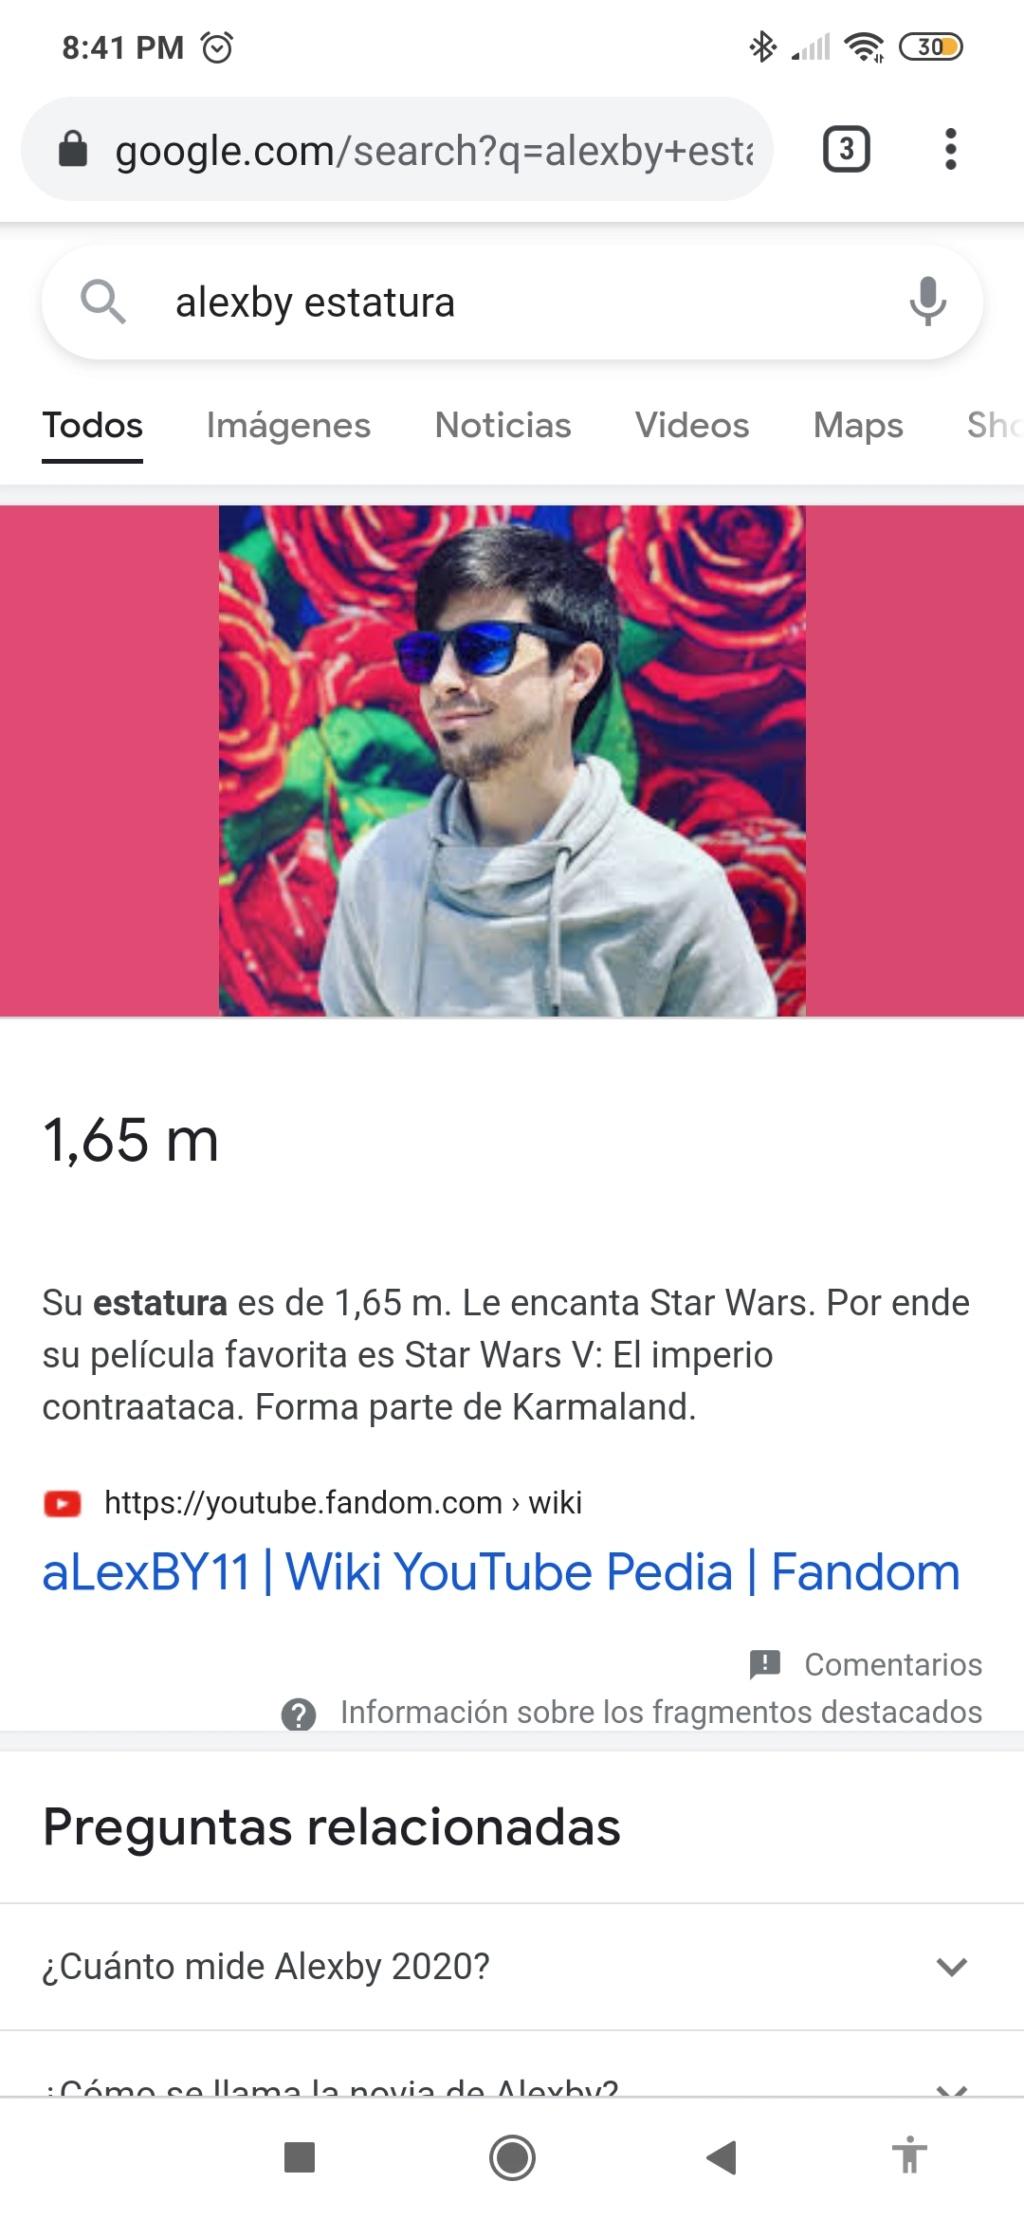 ¿Cuánto mide Alexby11? (Alexby Youtuber) - Altura - Página 10 Screen11